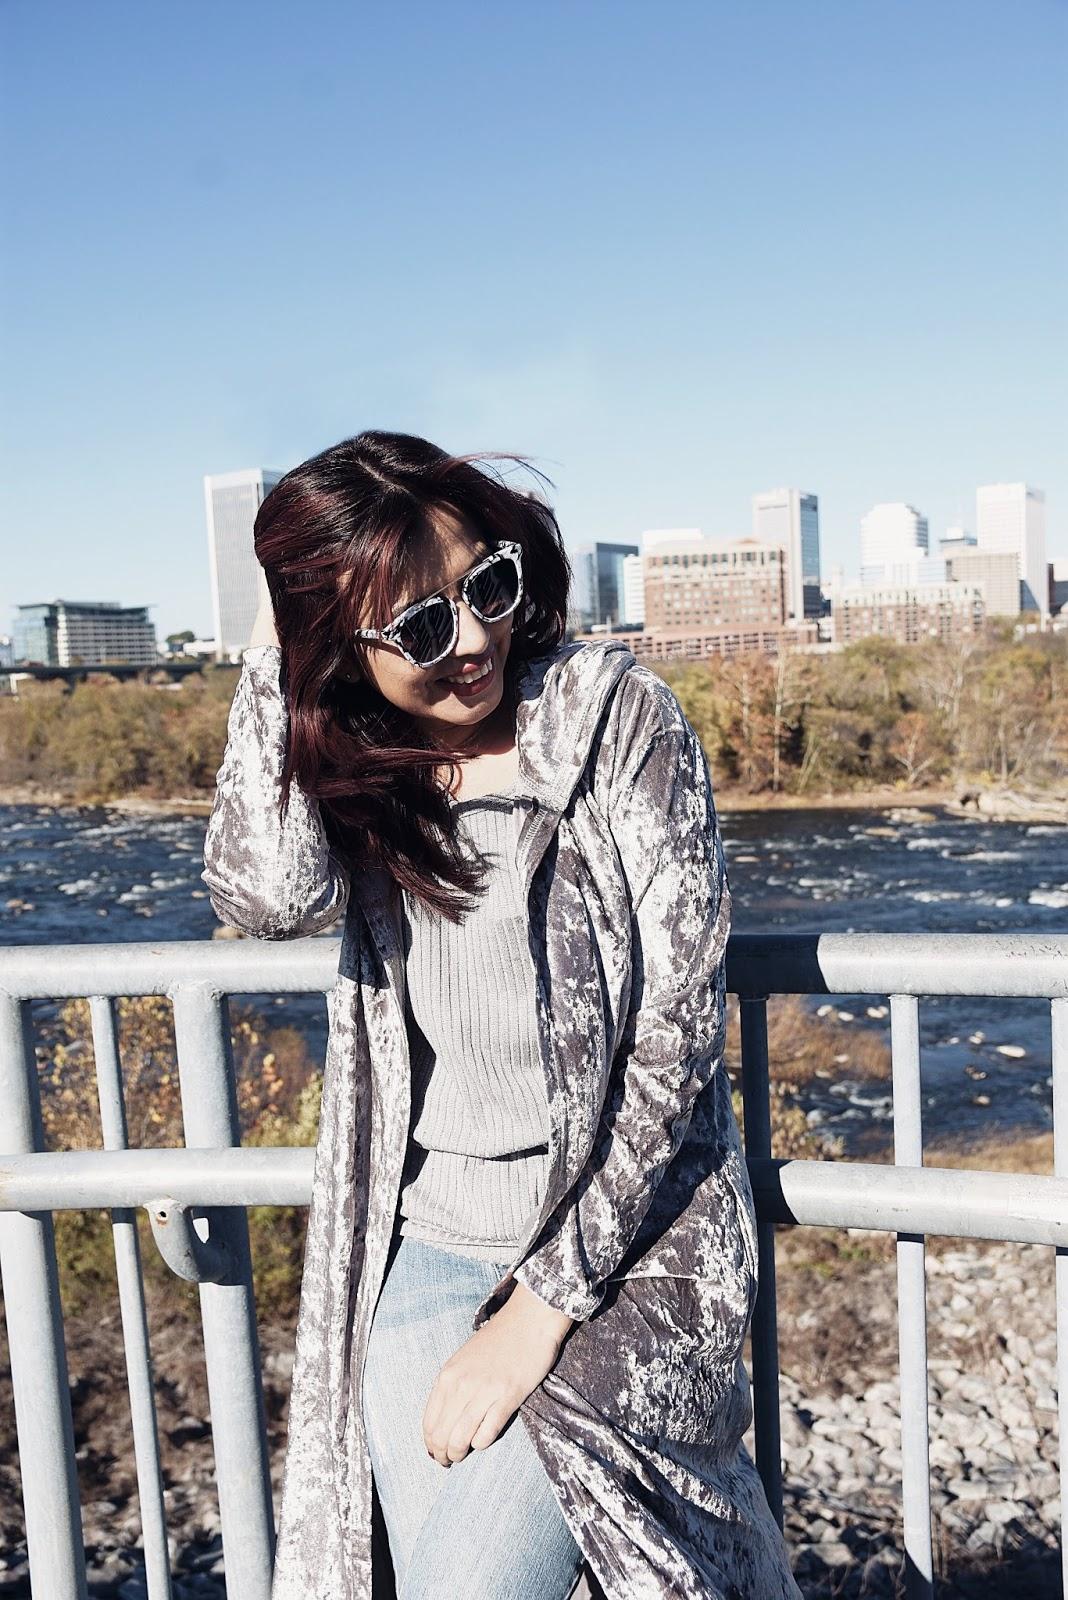 Wearing:  Marisol: Kimono: TwinkleDeals Jeans: Apple Jeans Top: Choies  Mau: Blazer: LightInTheBox Jeans: Tommy Hilfiger Tshirt: H&M Shoes: Reebock Classic